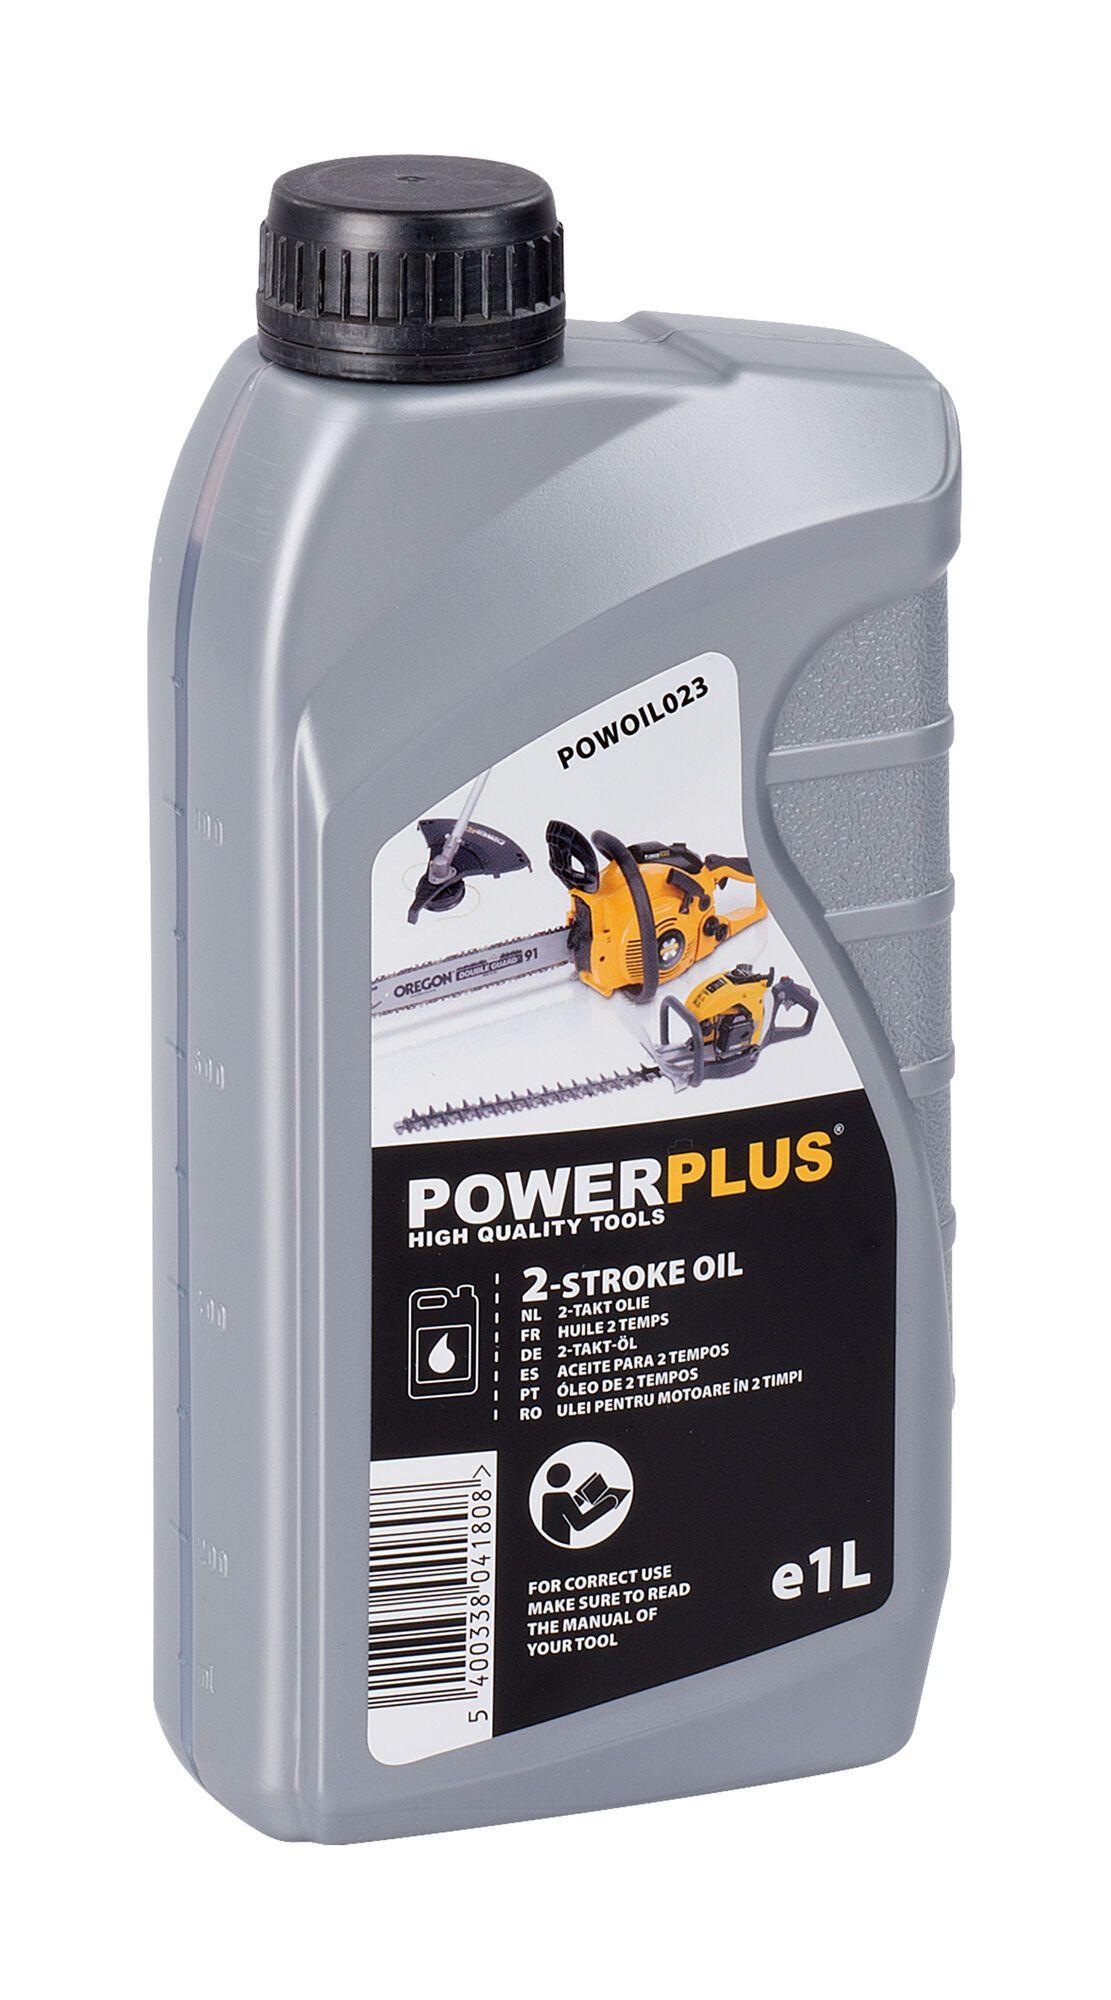 Powerplus POWOIL023 2 Takt olie 1 liter | Voor 2-takt machines